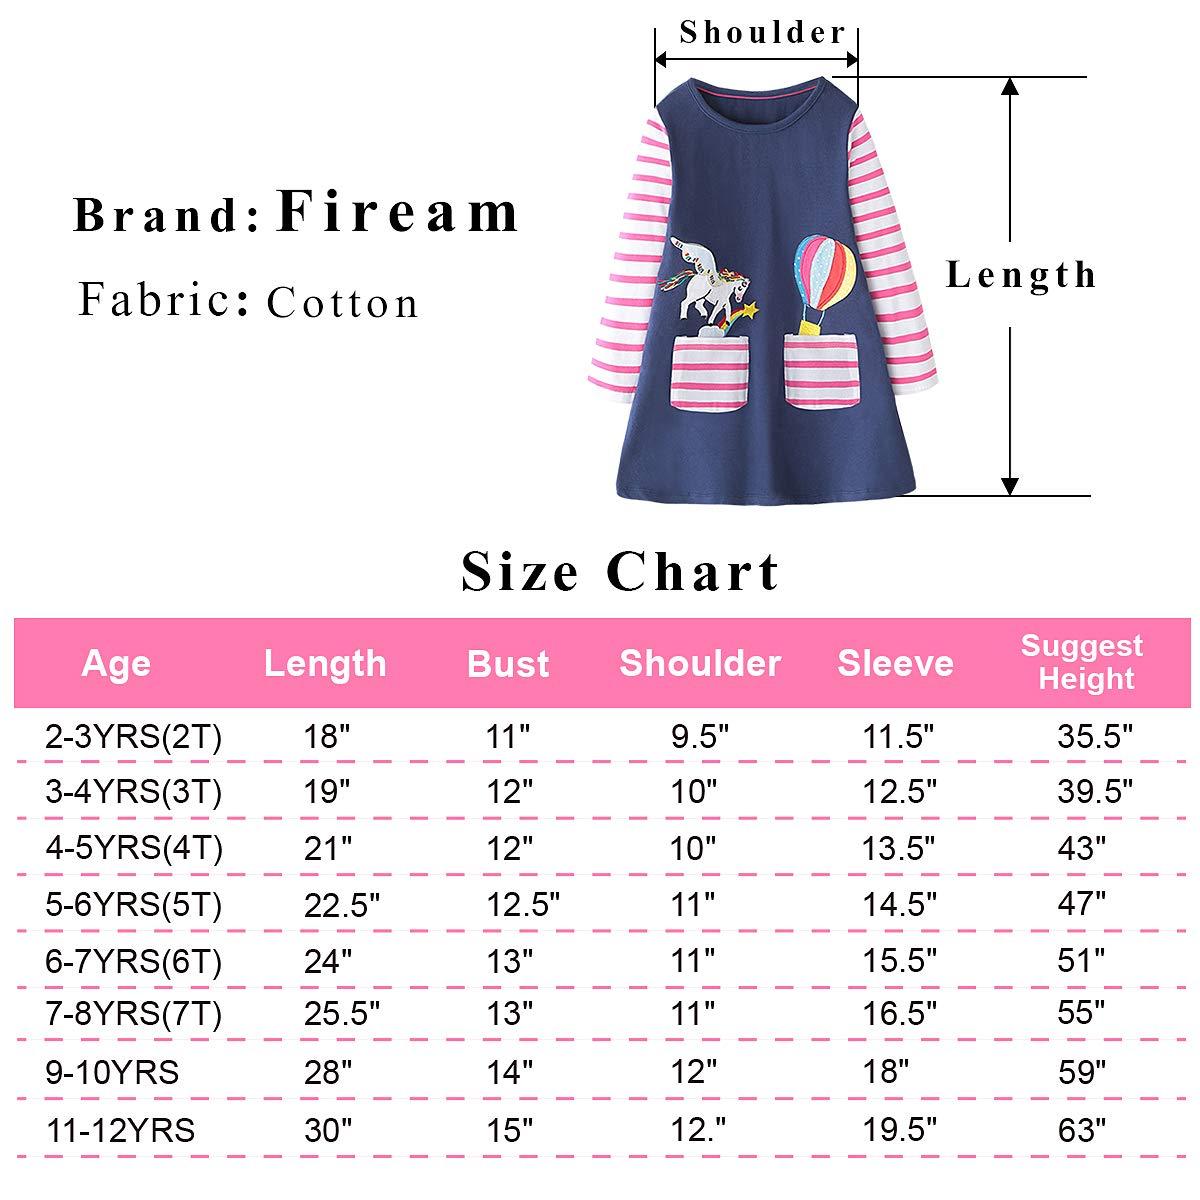 Fiream Girls Cotton Longsleeve Casual Dresses Applique Cartoon TZlyq002